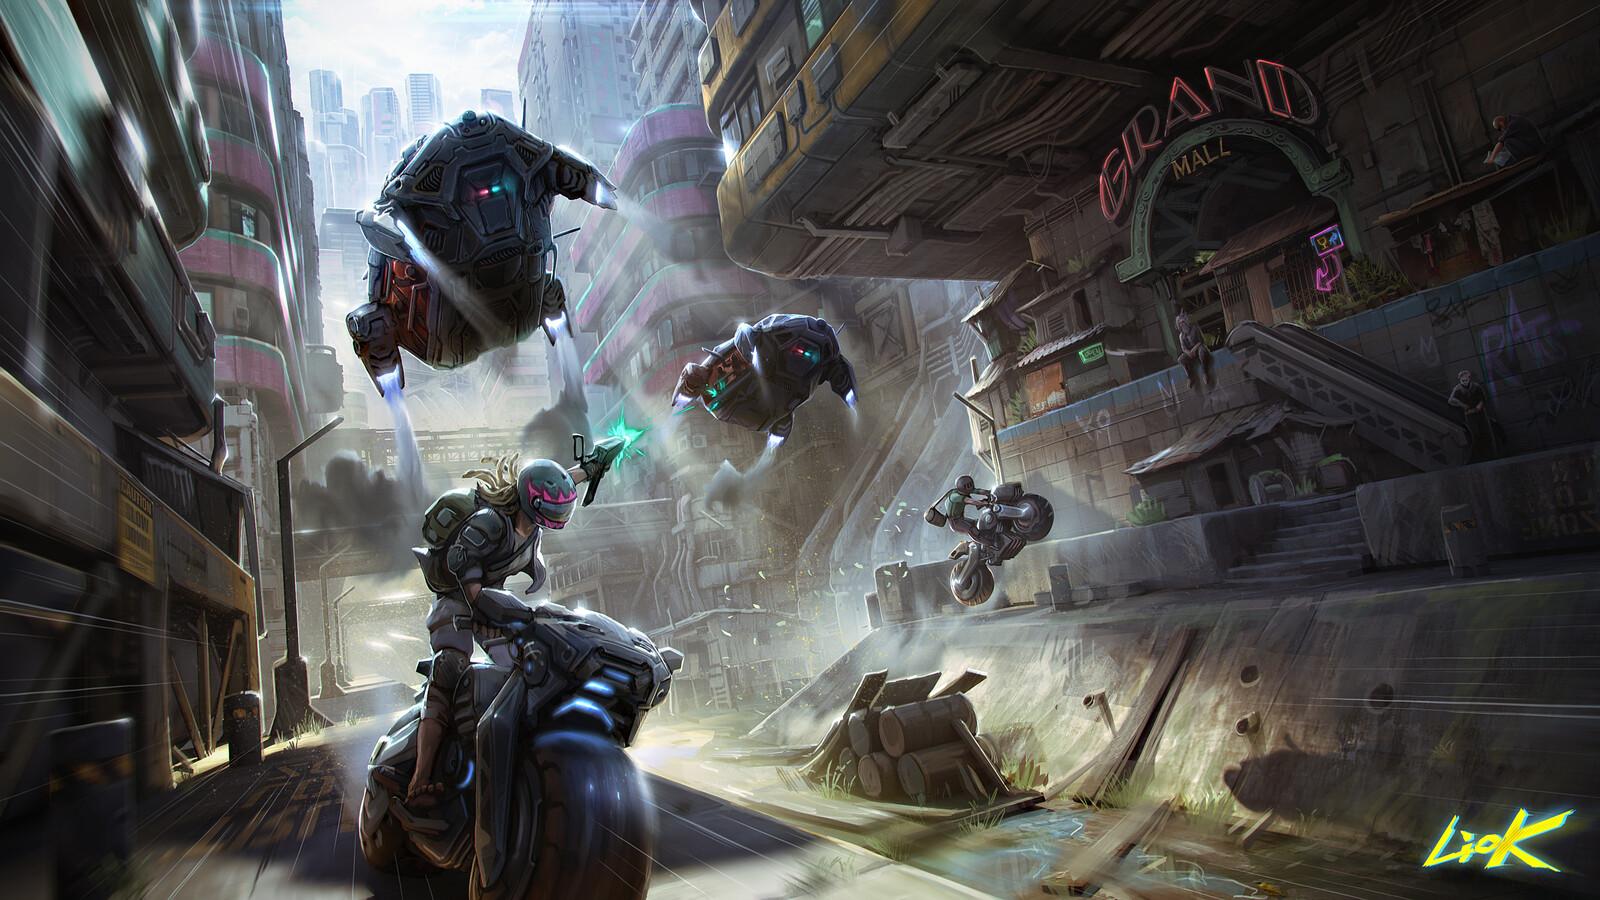 Heist chase, Cyberpunk 2077 challenge on digital painitng school.